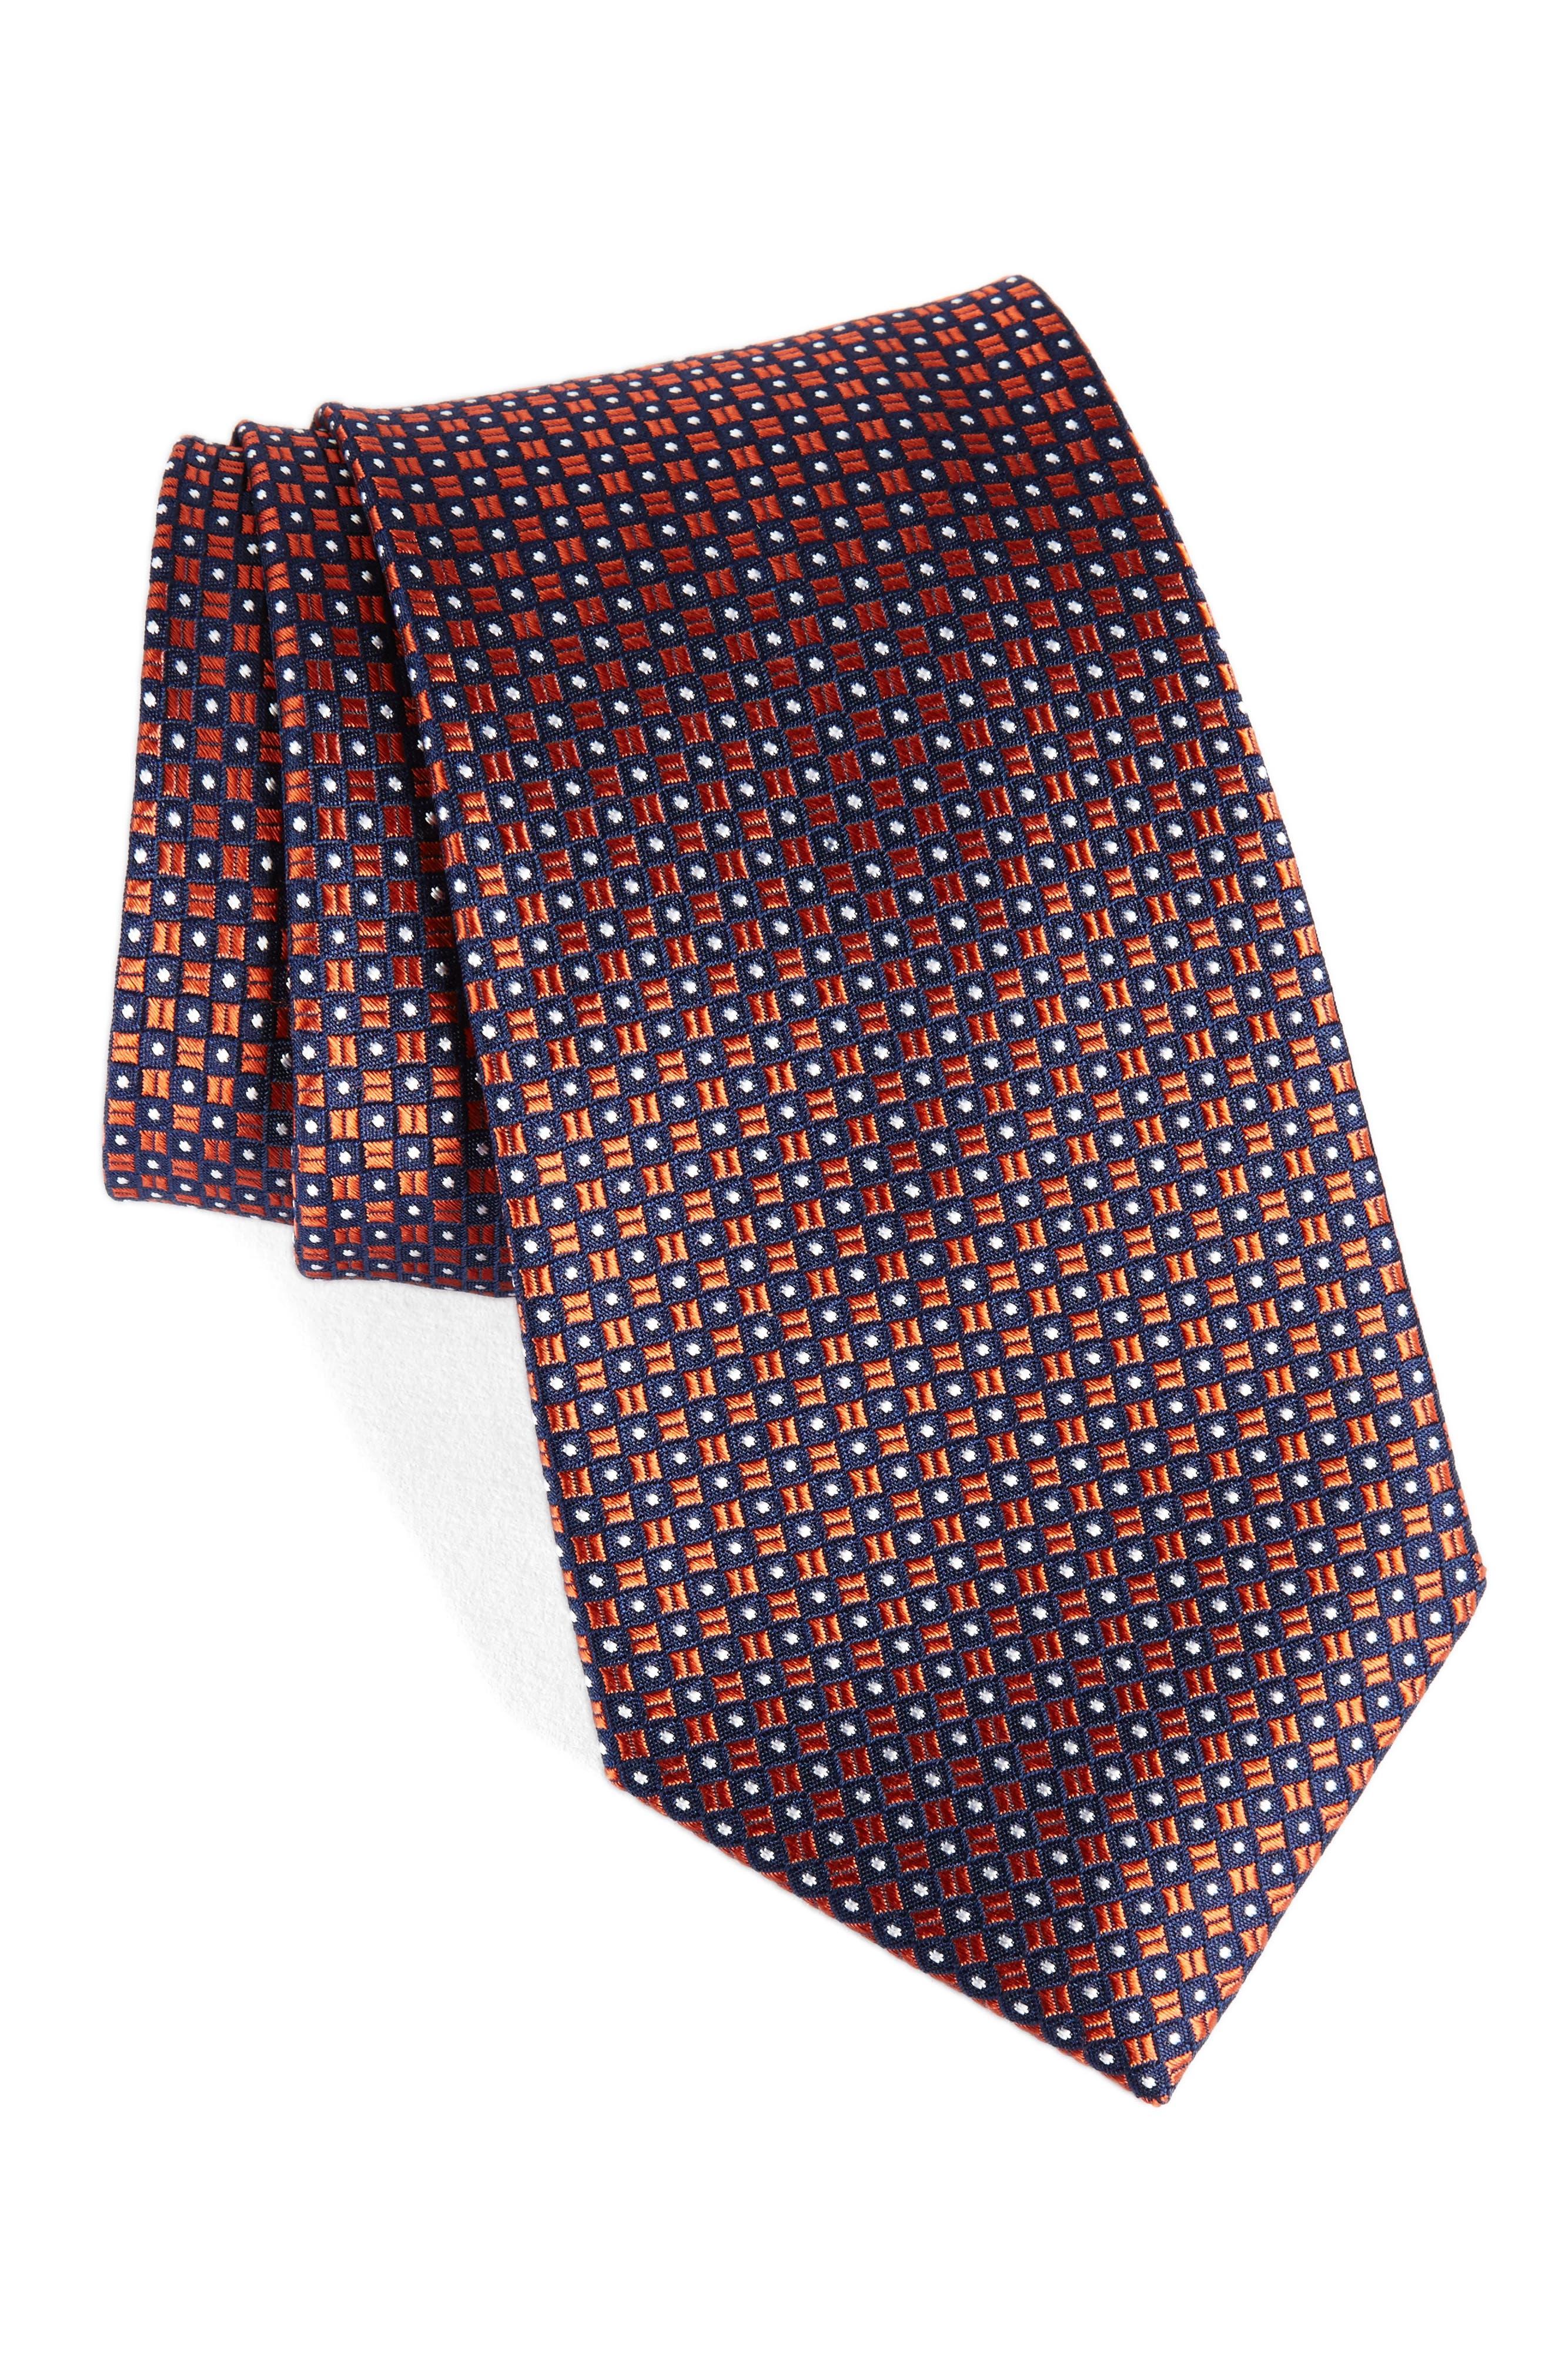 Nordstrom Men's Shop Purquet Pin Dot Silk Tie